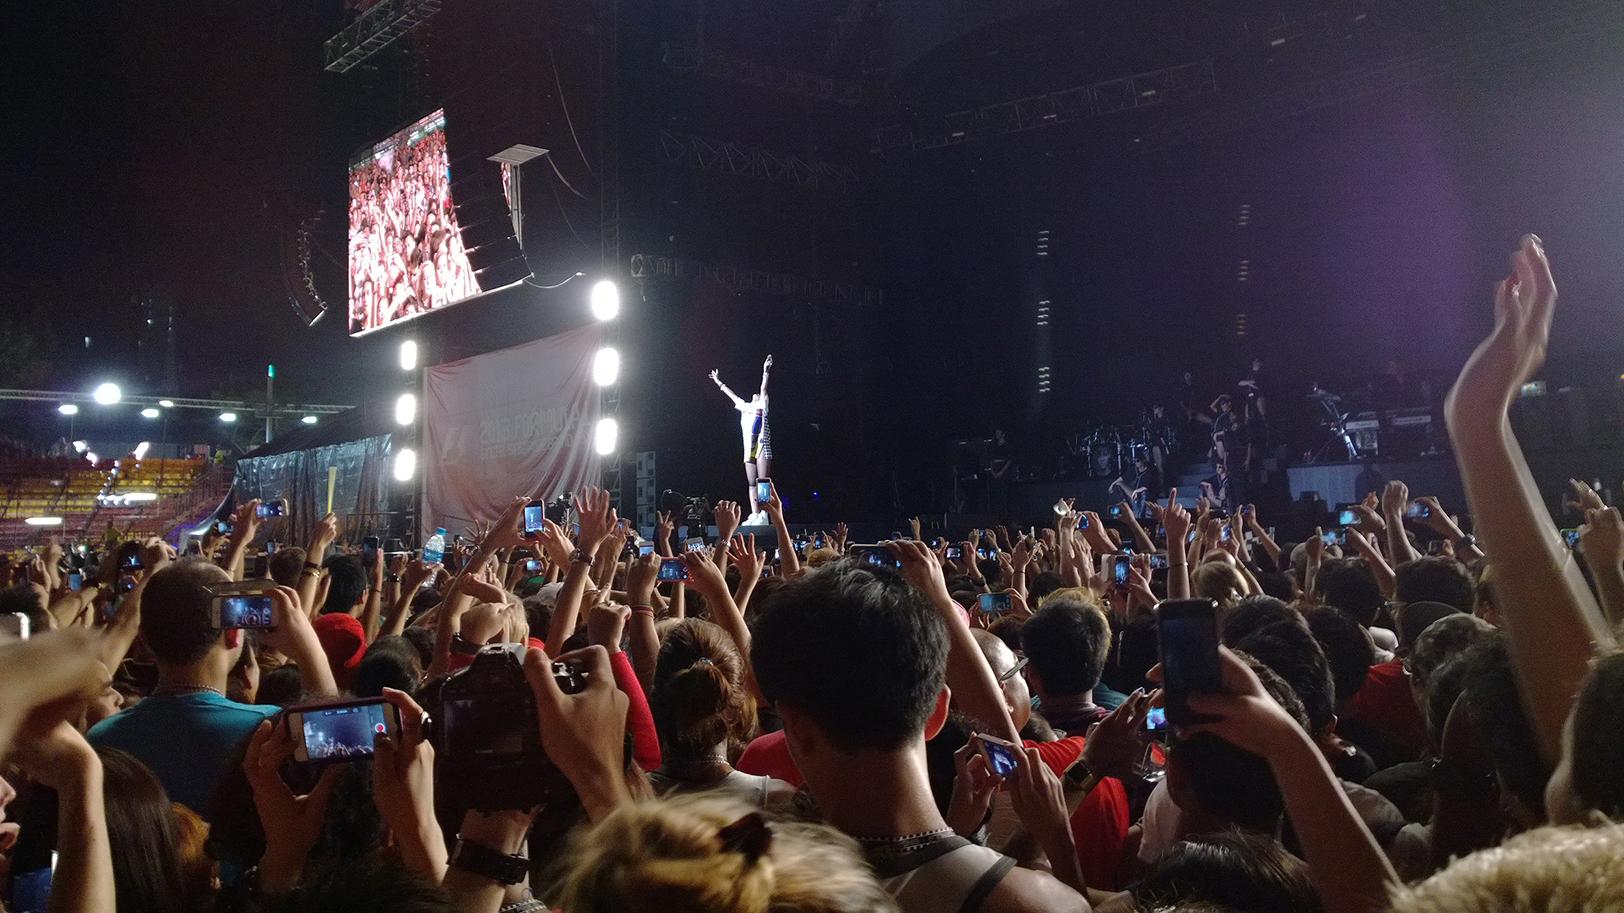 Nokia-Lumia-1020-Rihanna-concert